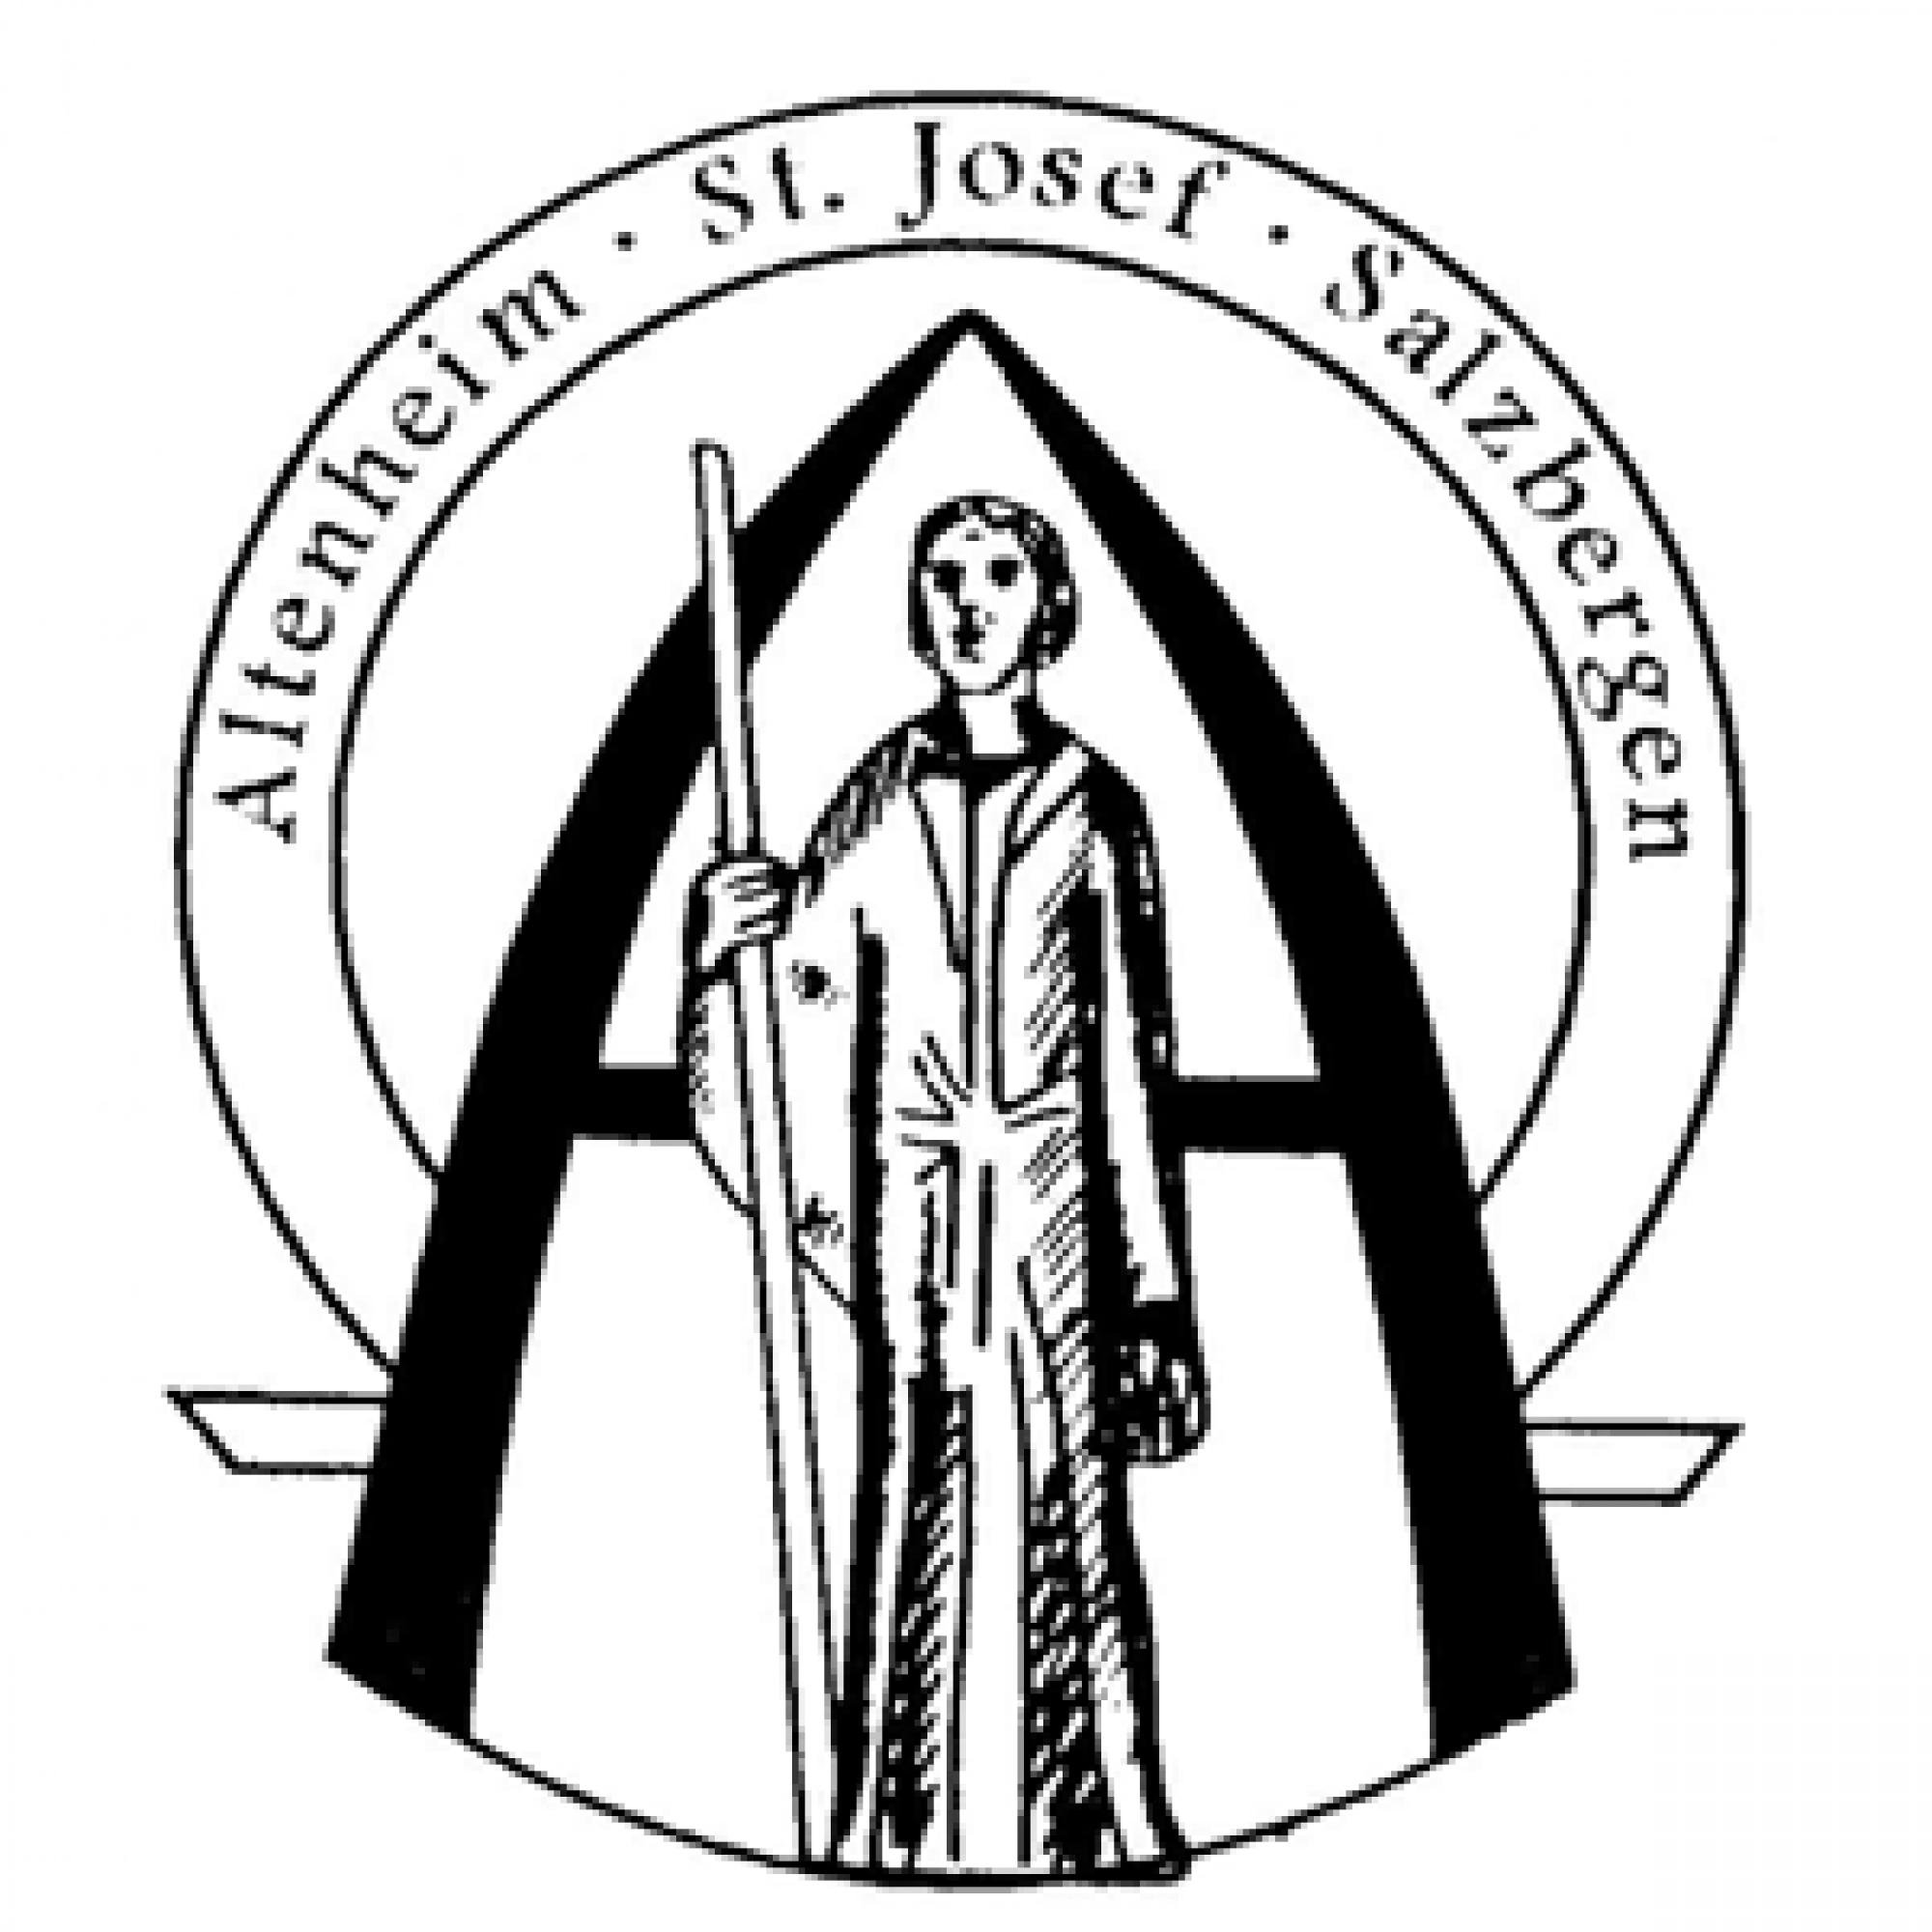 Altenheim Haus St. Josef